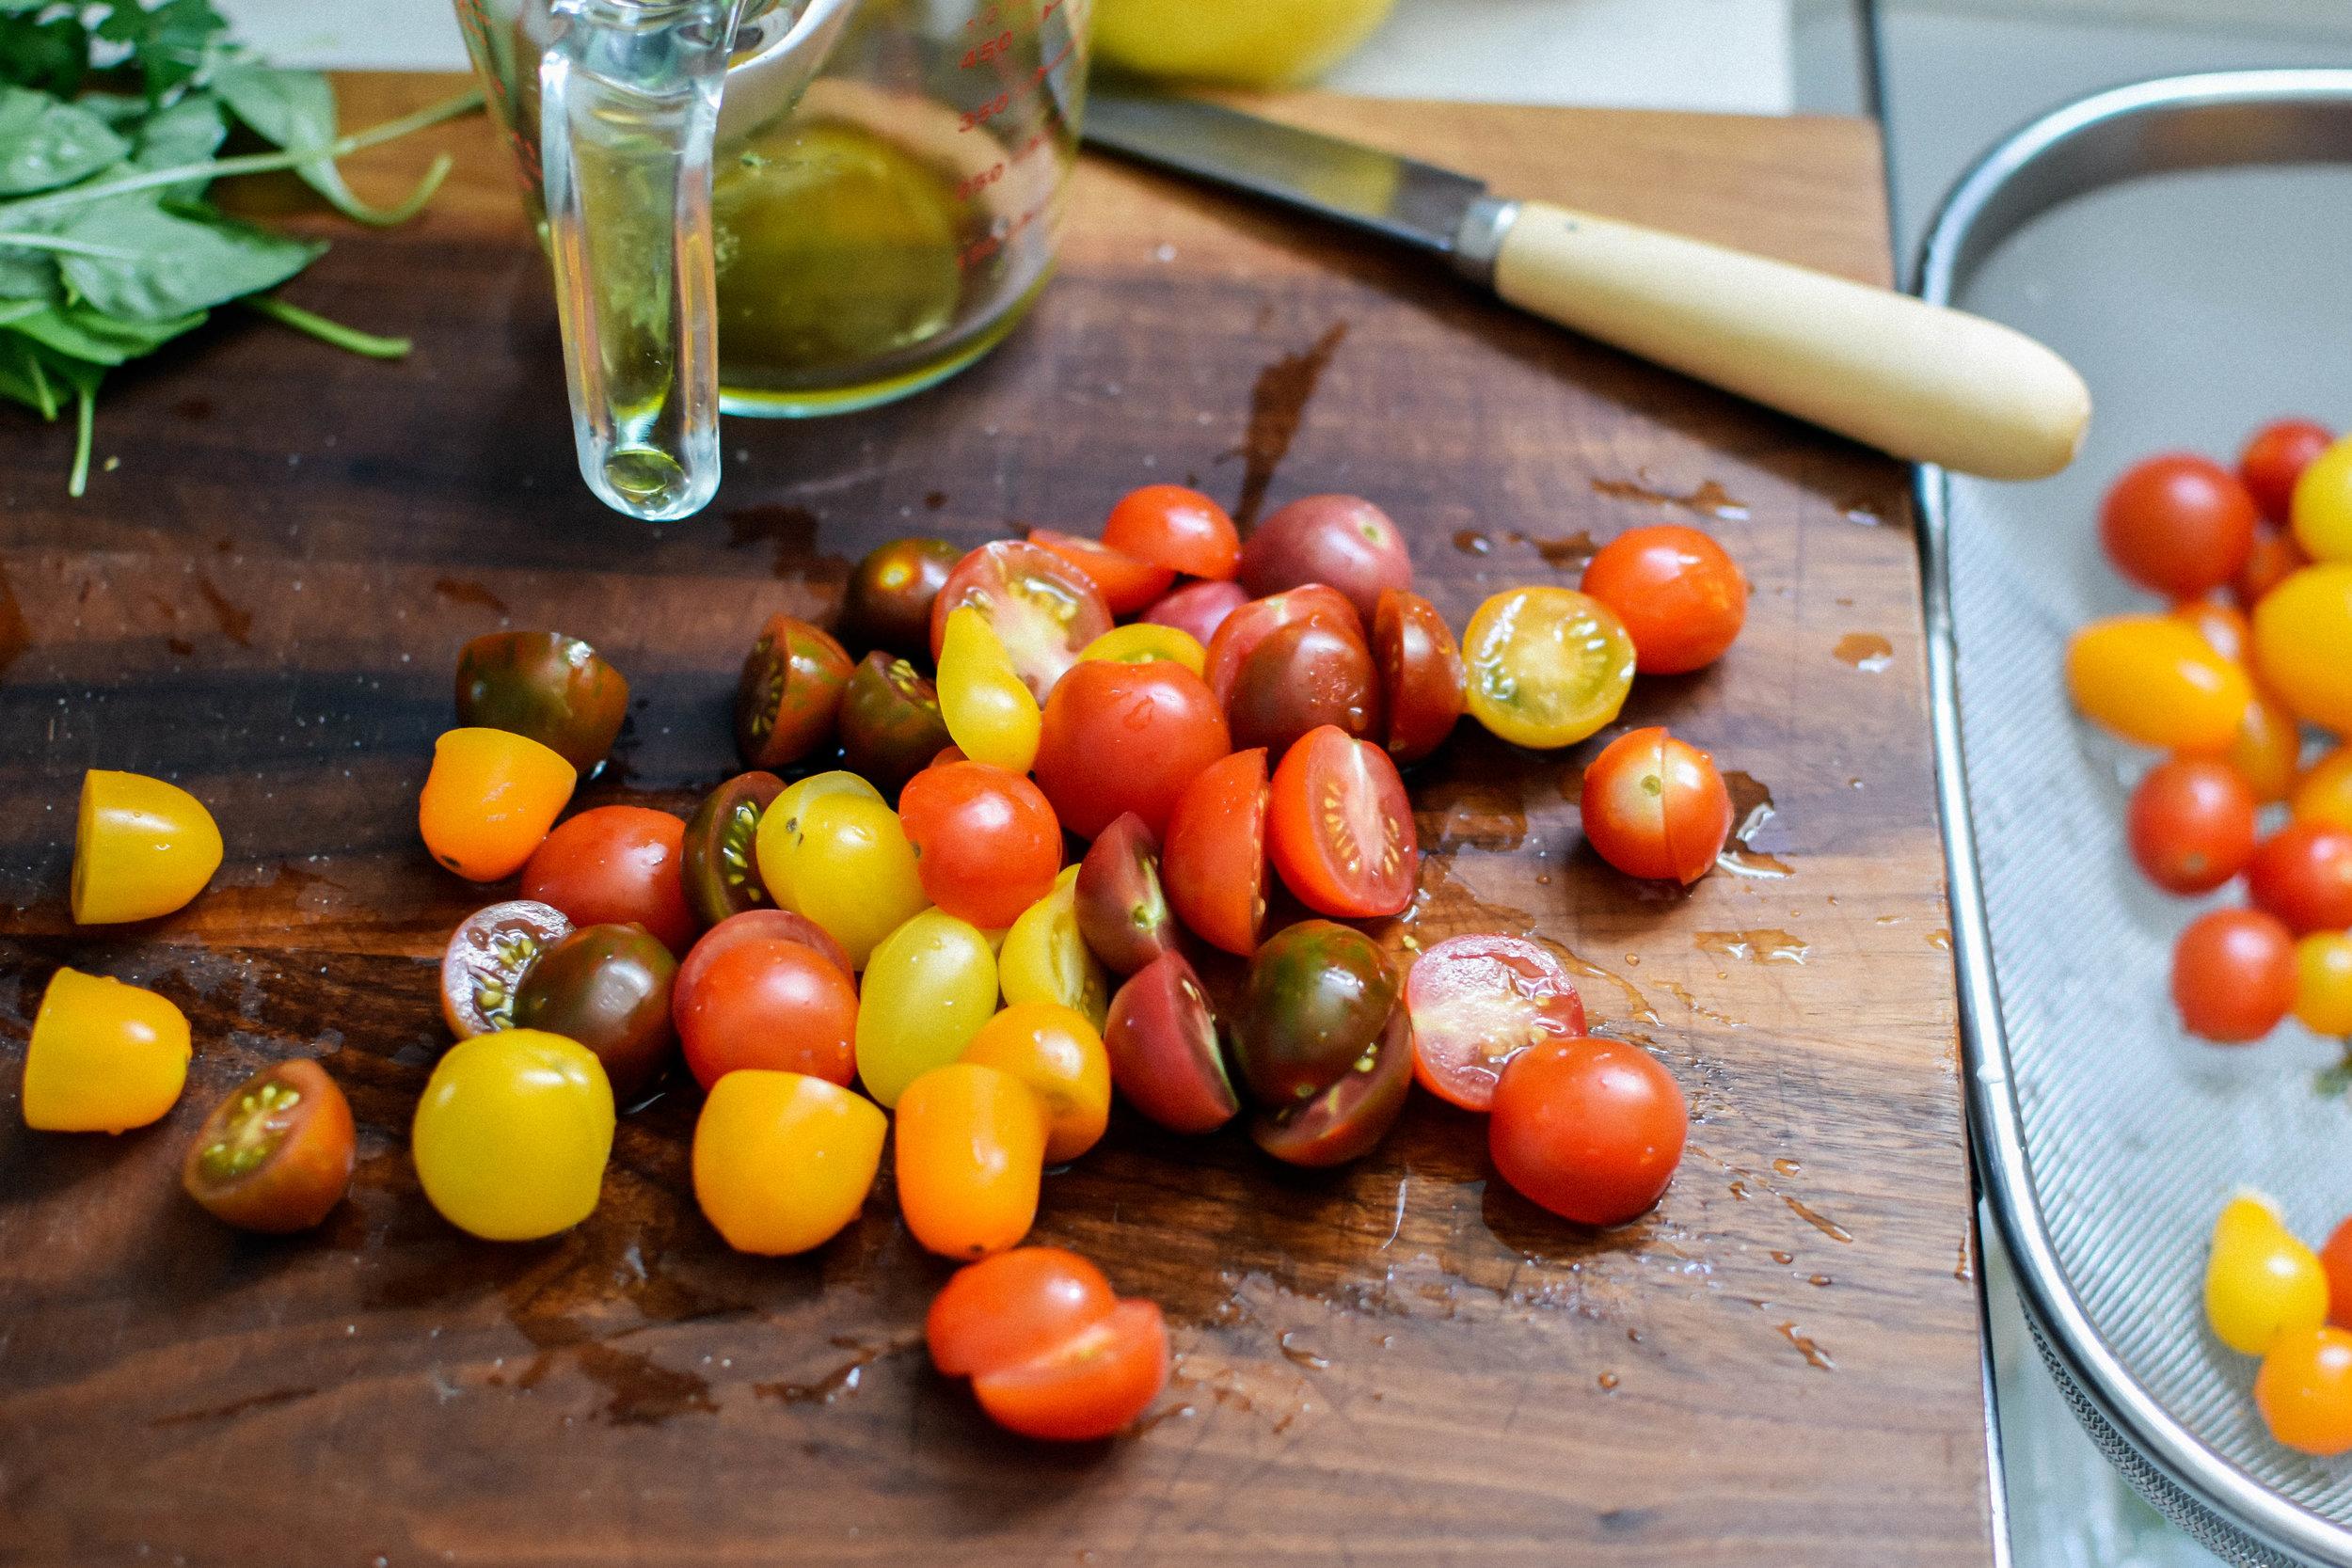 Pasta elbows with pesto and fresh tomatoes